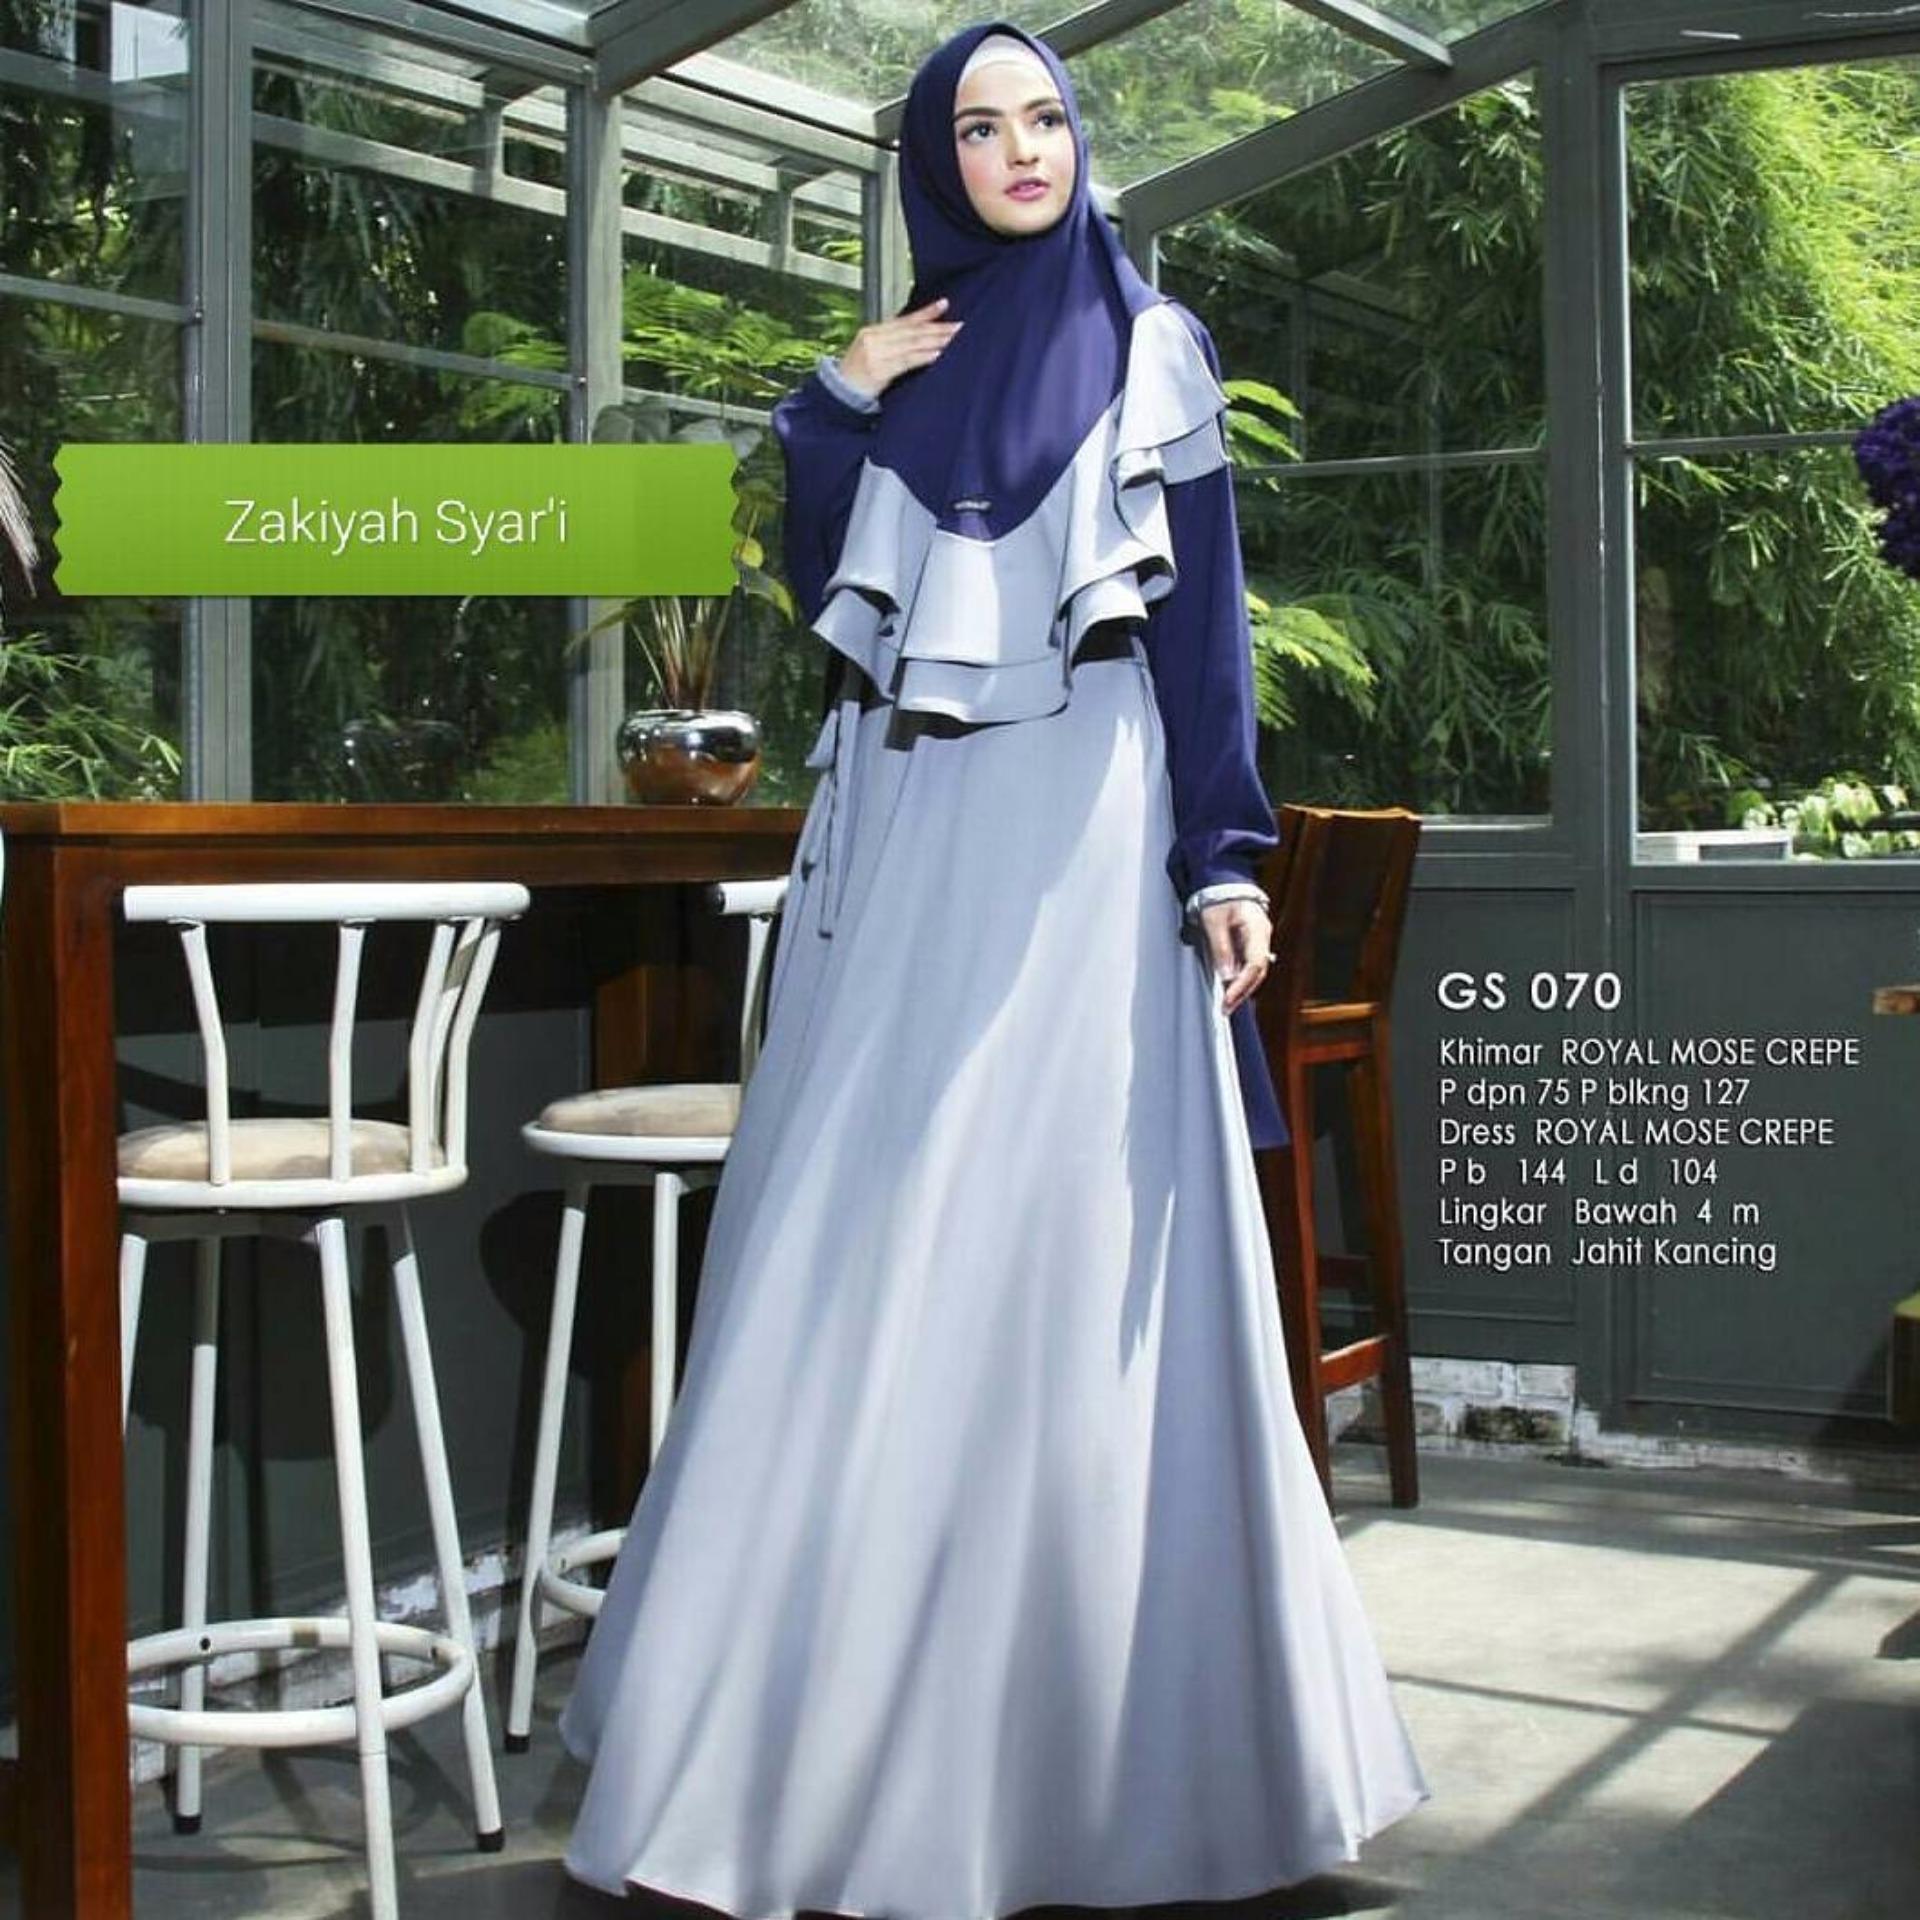 Beli Baju Original Gamis Zakiyah Syar I Dress Baju Panjang Muslim